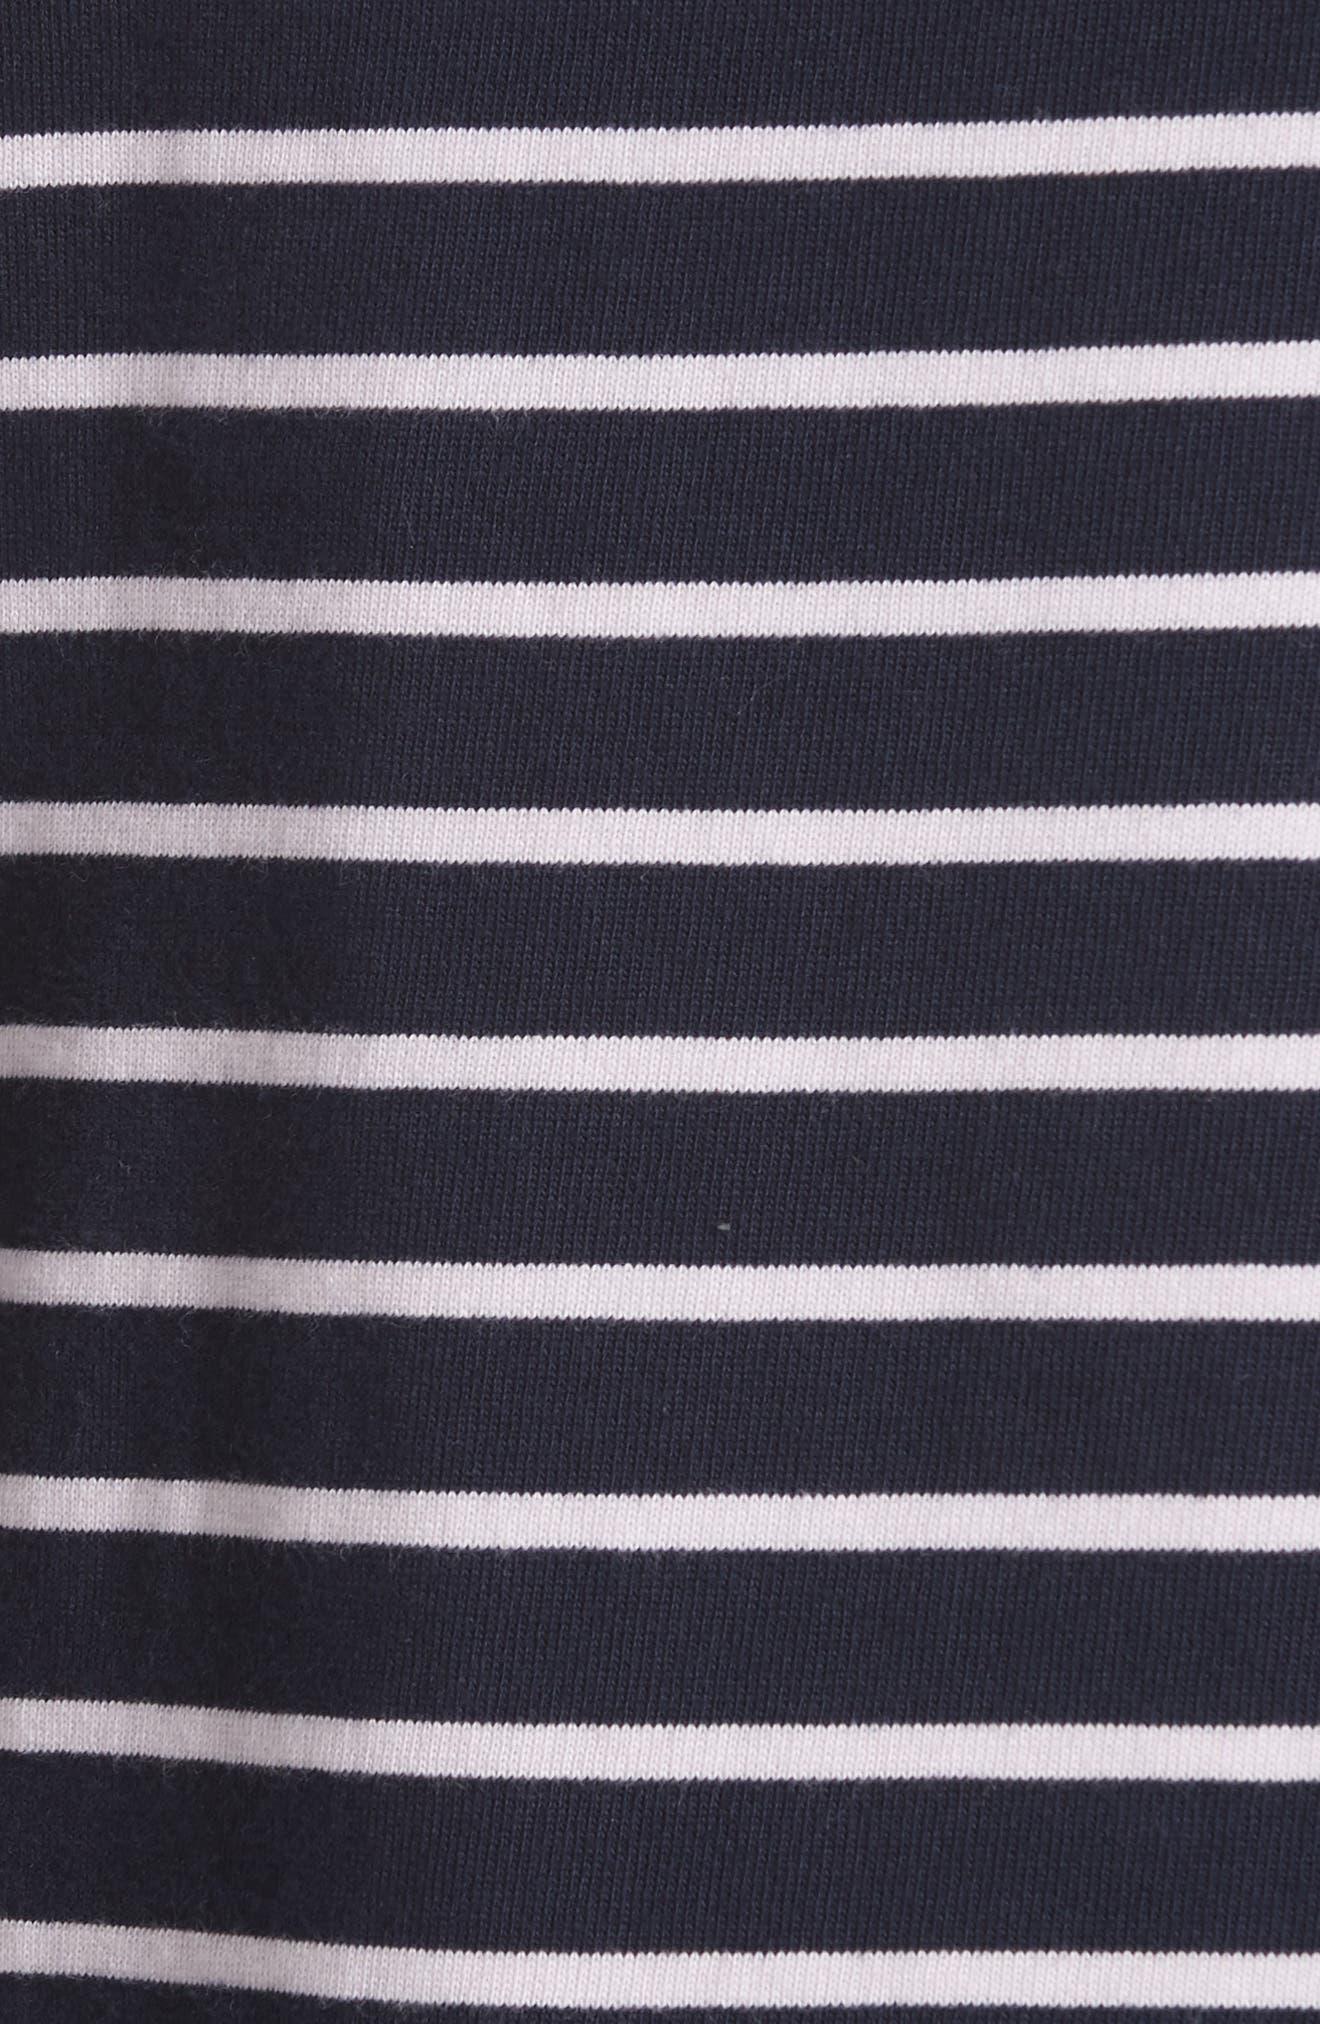 Stripe Top,                             Alternate thumbnail 5, color,                             Midnight Navy Combo